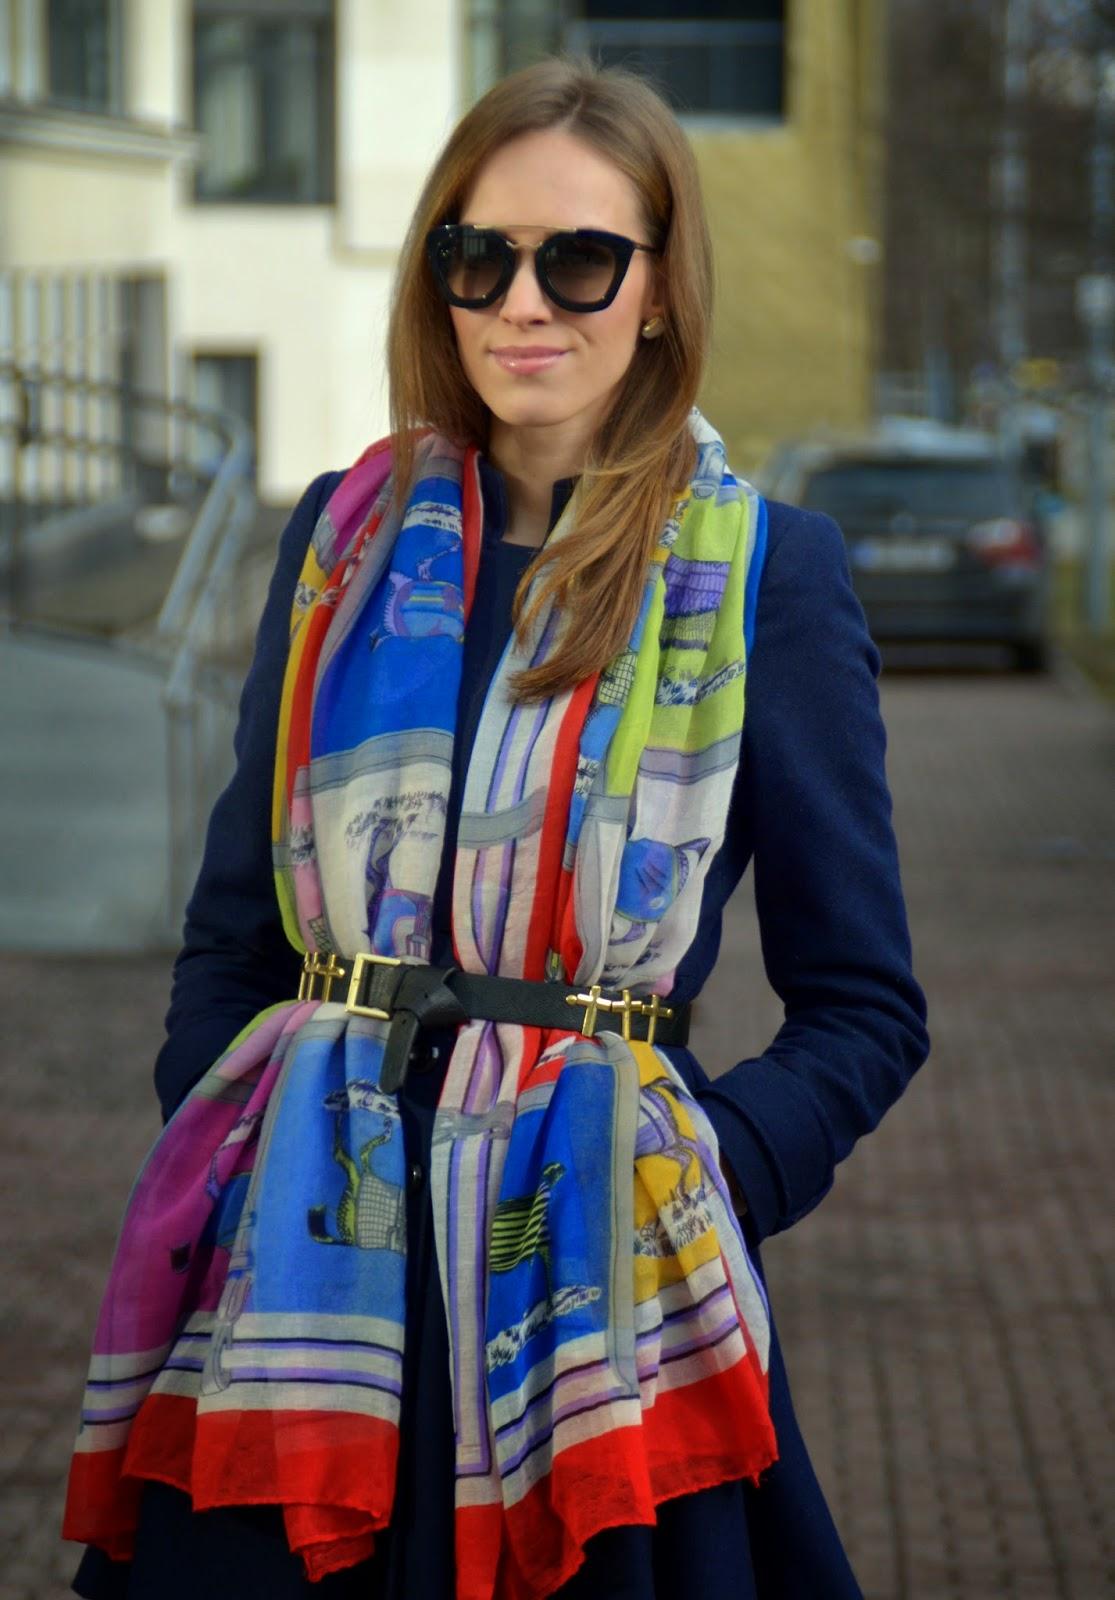 prada-sunglasses-oversized-scarf-coat-outfit kristjaana mere